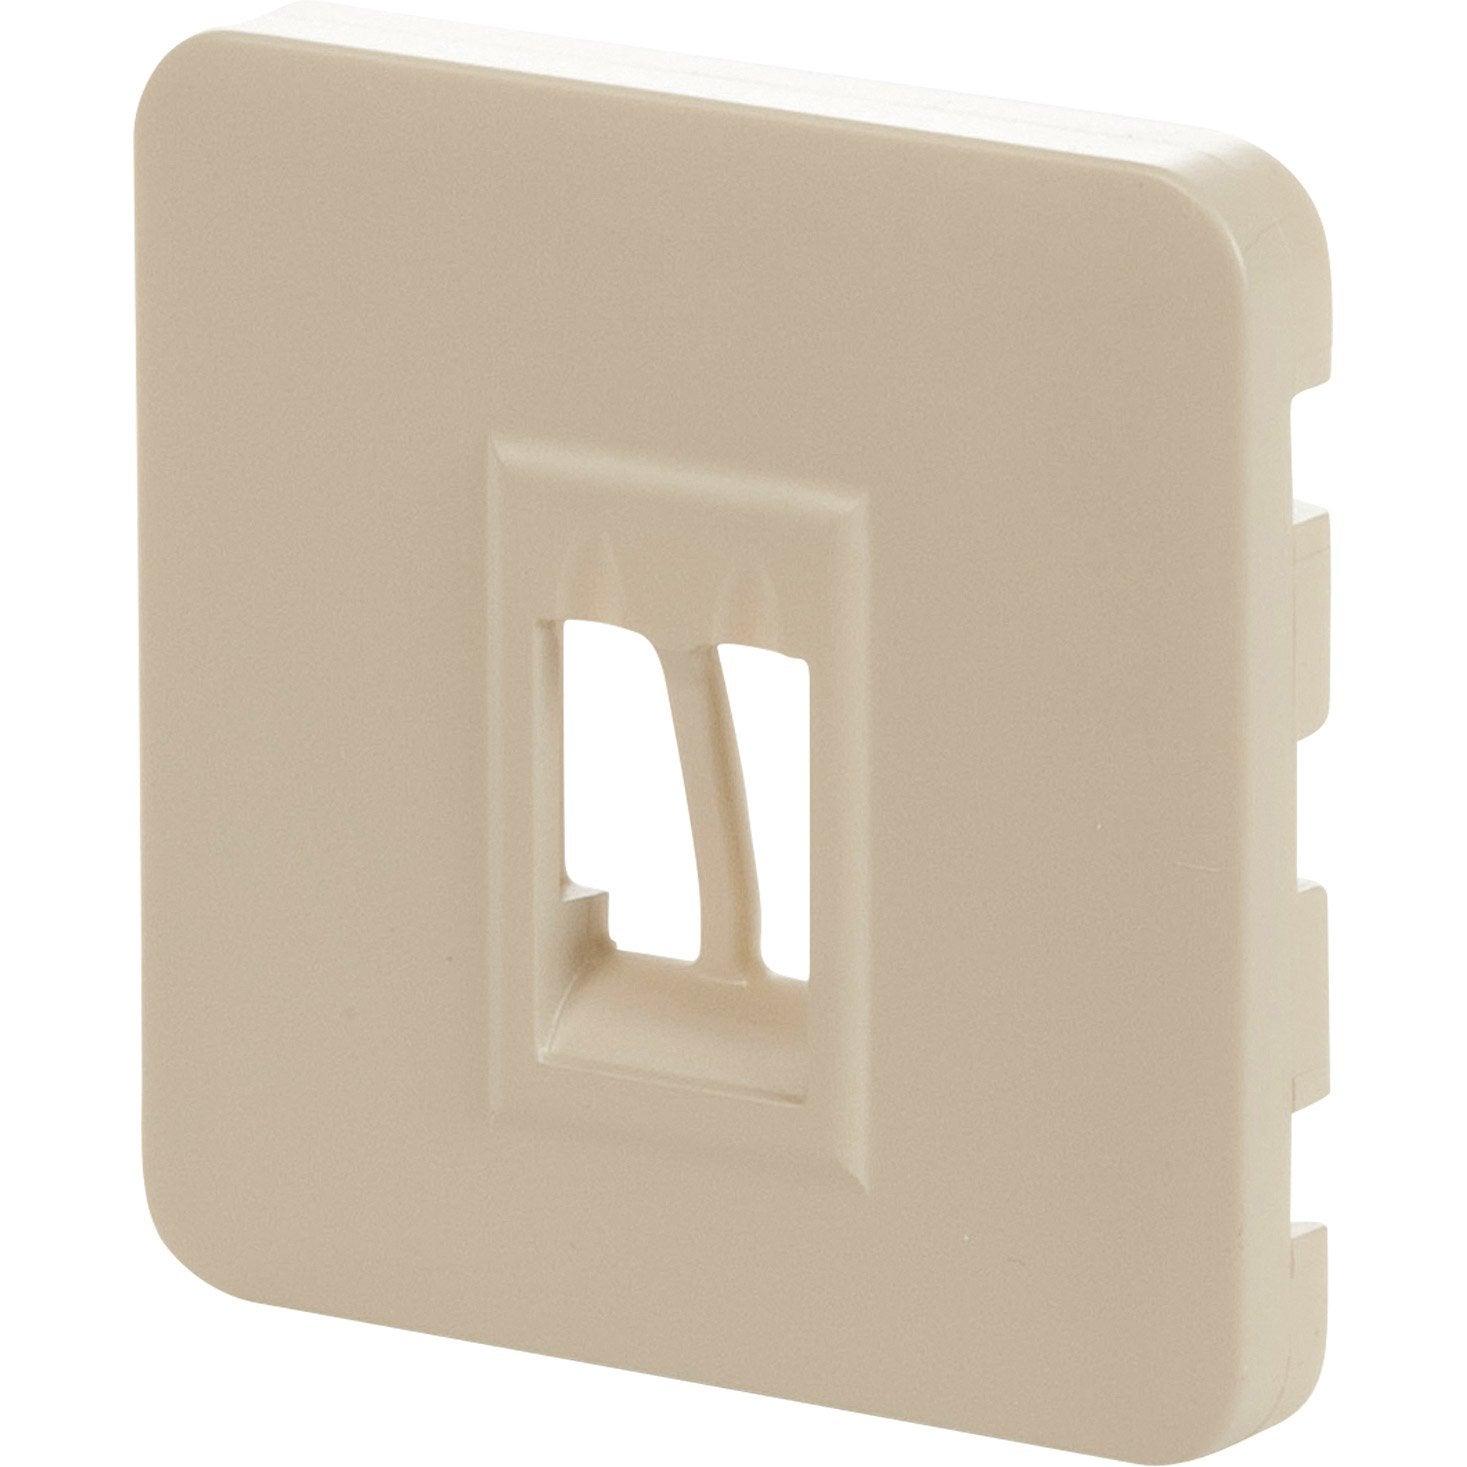 cache prise haut parleur cosy lexman gris dor n 5 mat leroy merlin. Black Bedroom Furniture Sets. Home Design Ideas